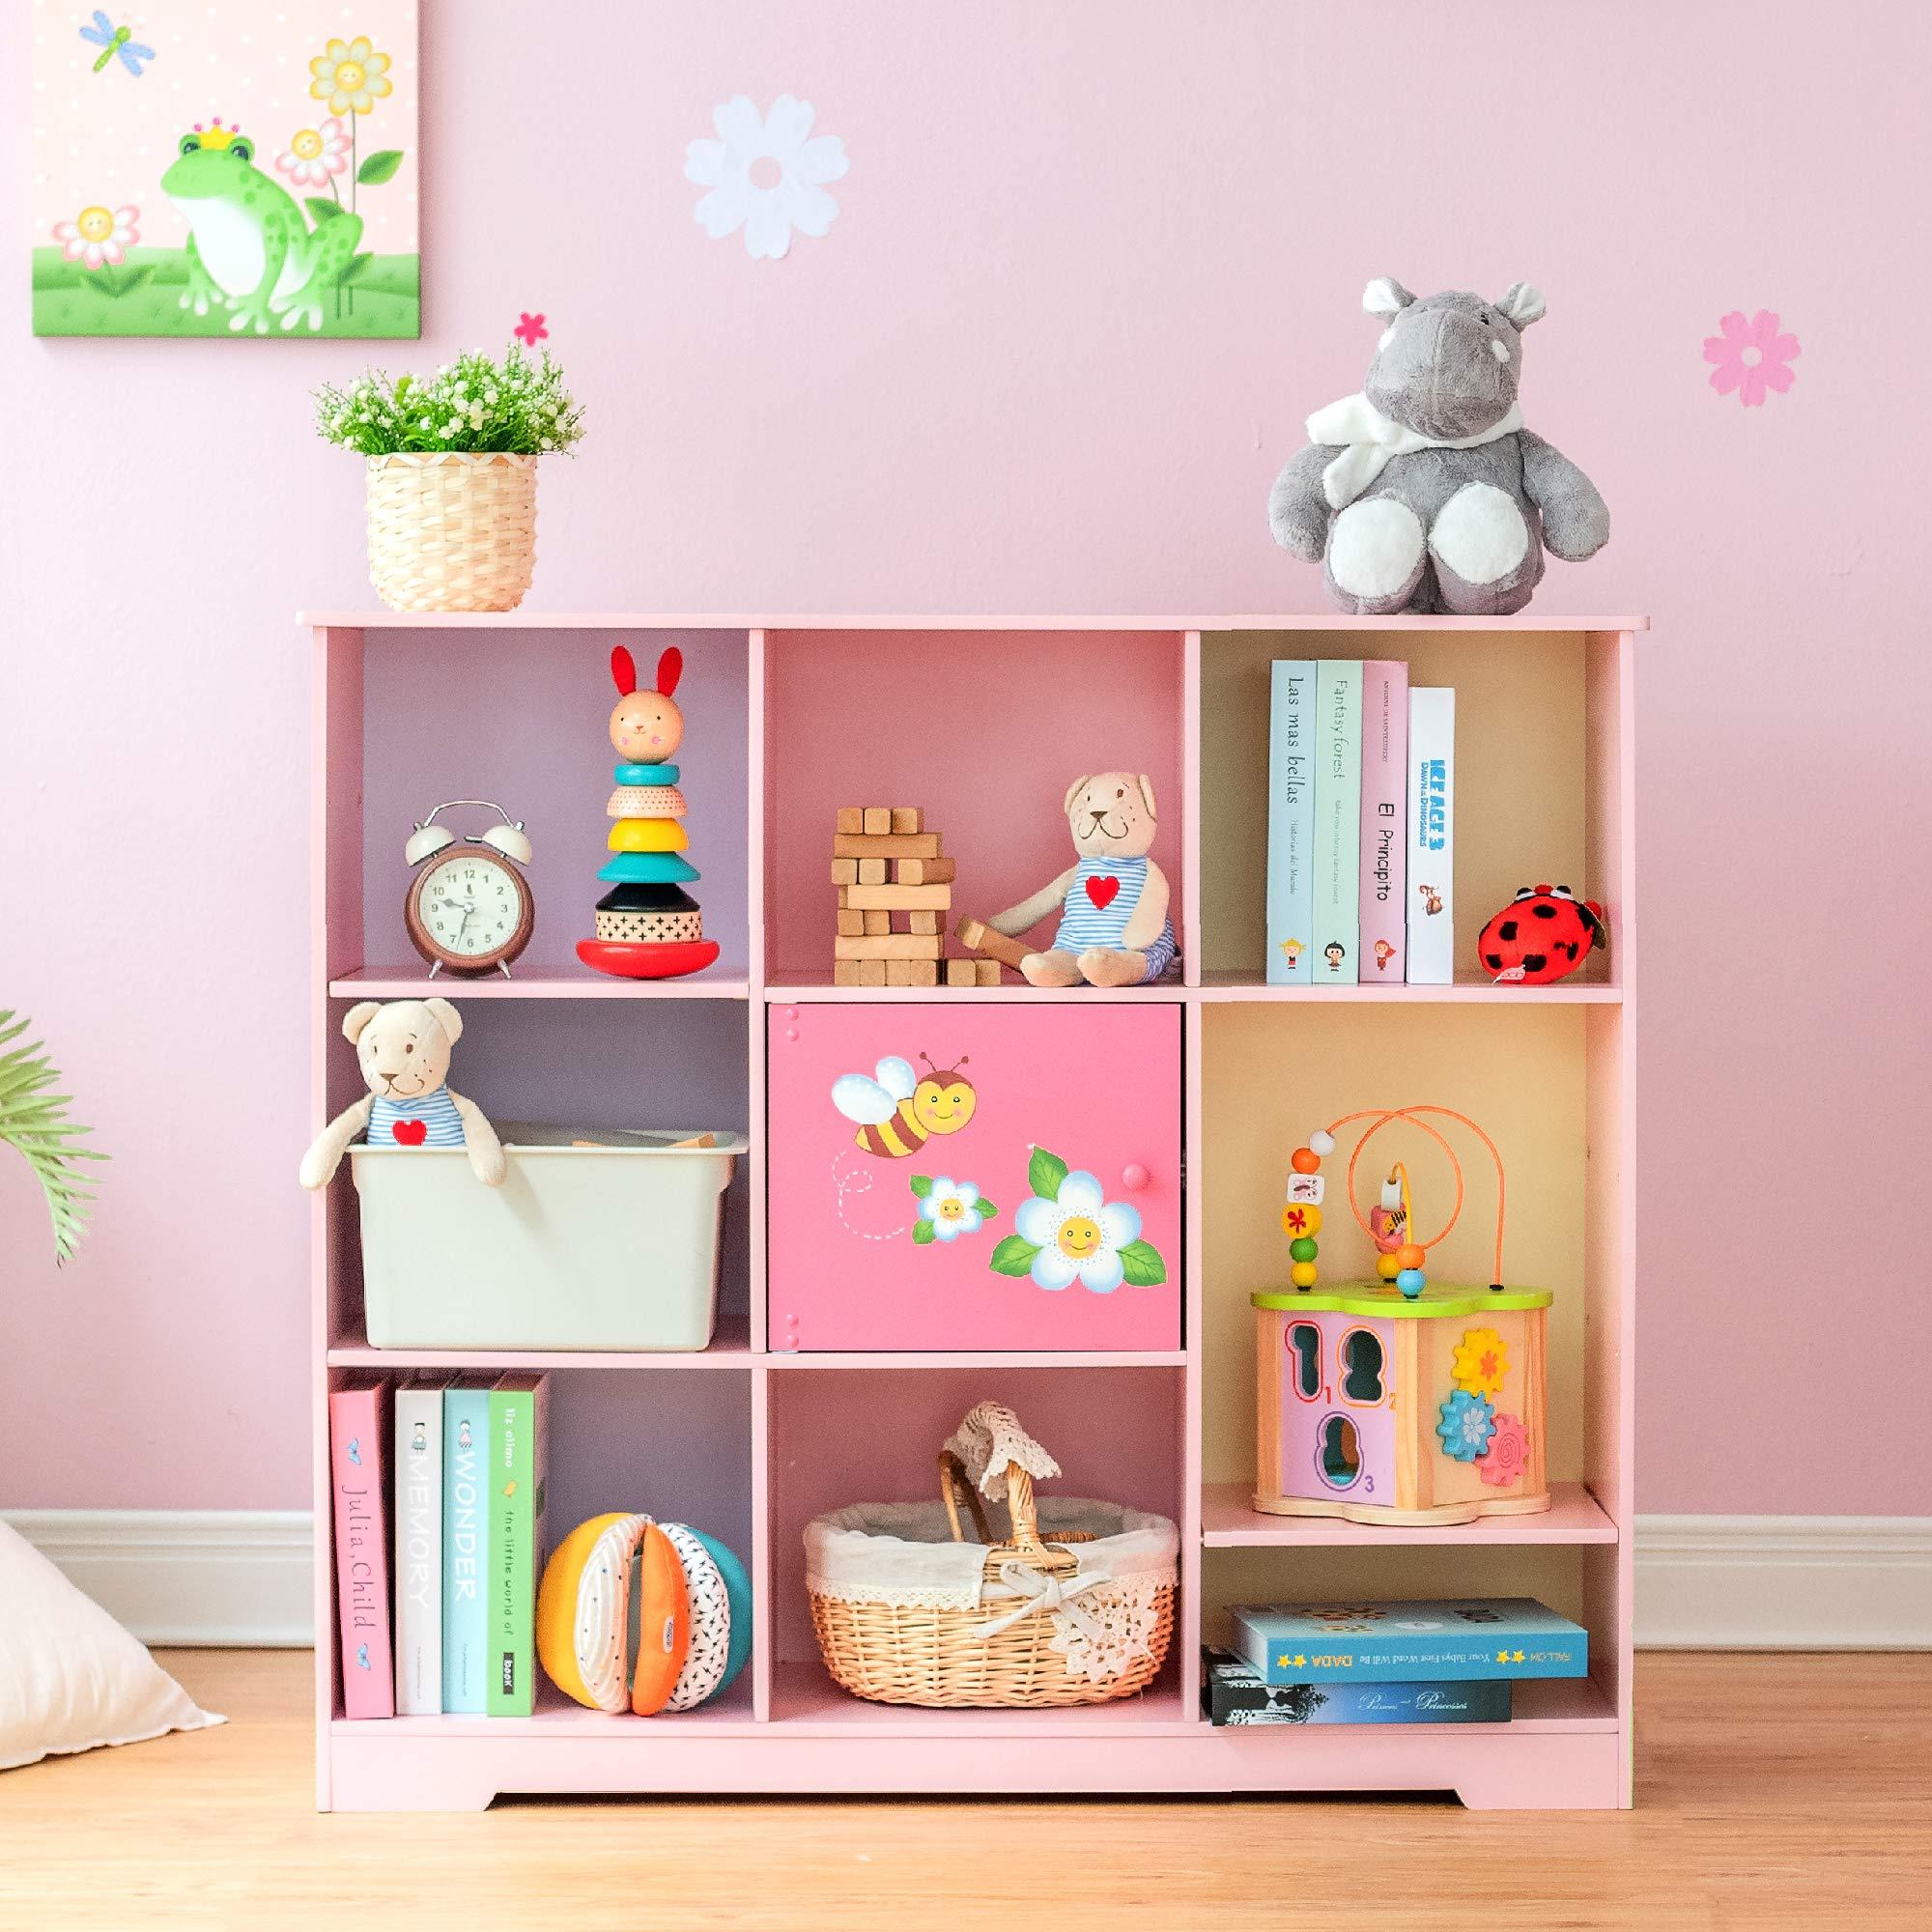 Fantasy Fields - Magic Garden Adjustable Cube Bookshelf, 9 Cube Storage Bookshelf by Fantasy Fields